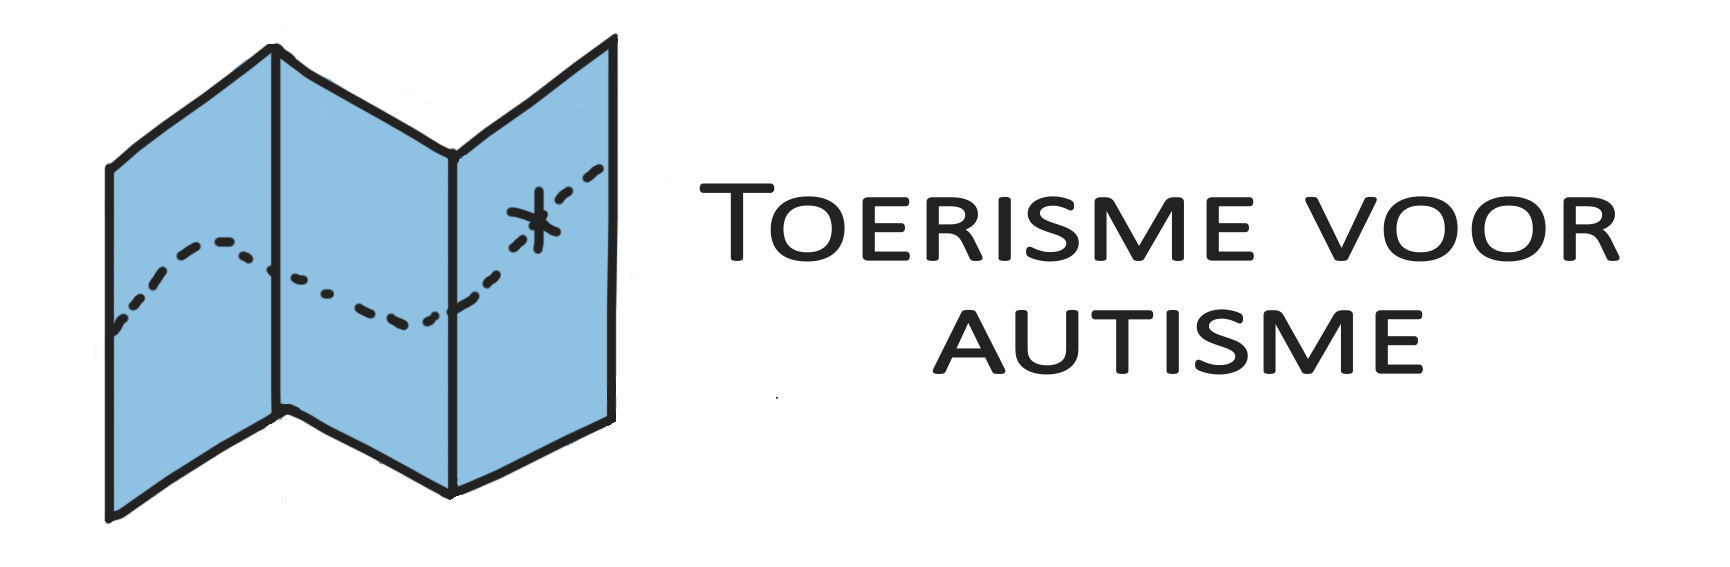 Toerisme voor Autisme